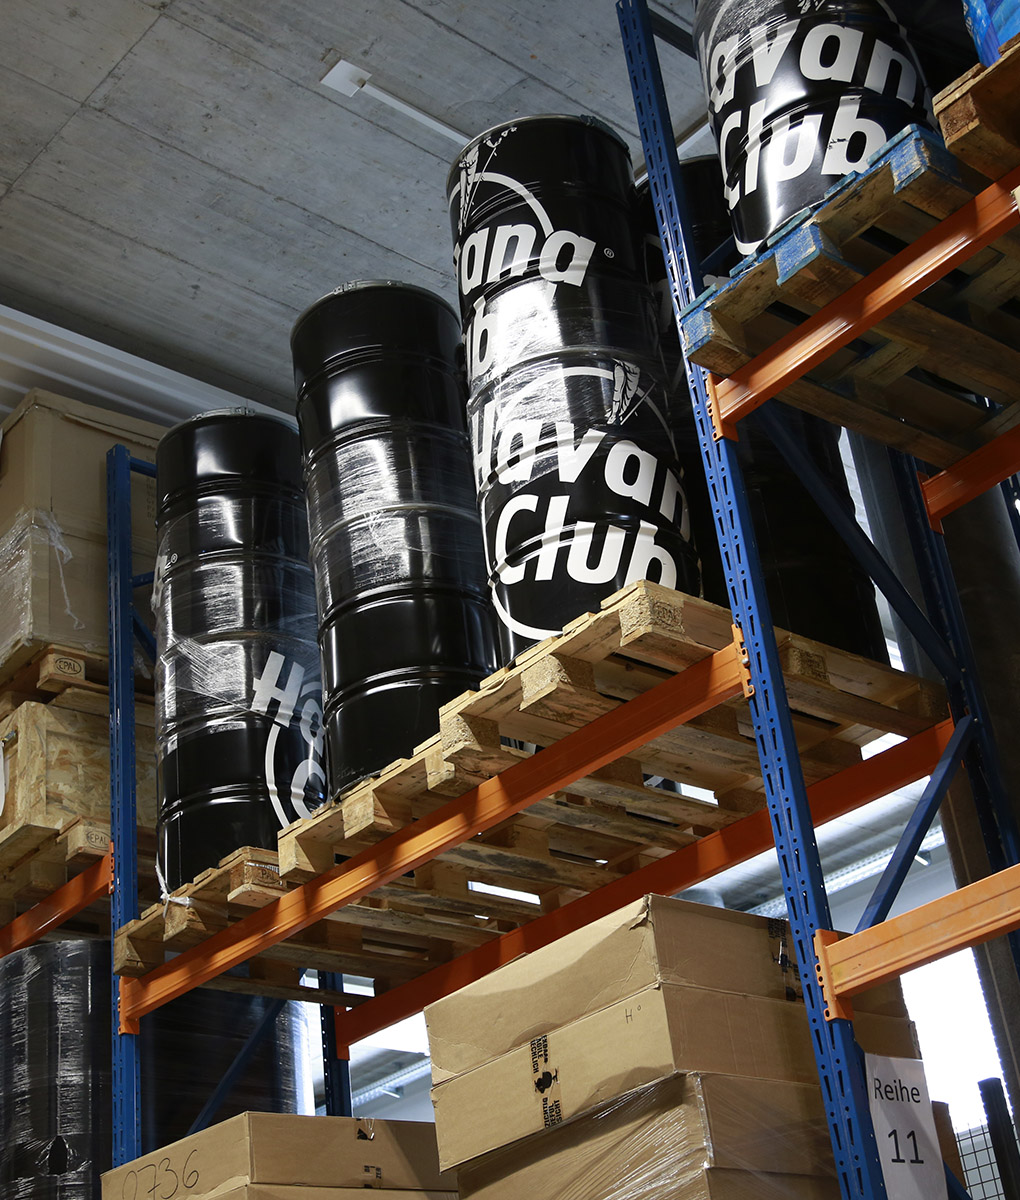 promotion-tools_logistik_pernod_ricard_havana_club_hochlager_66B0717_2